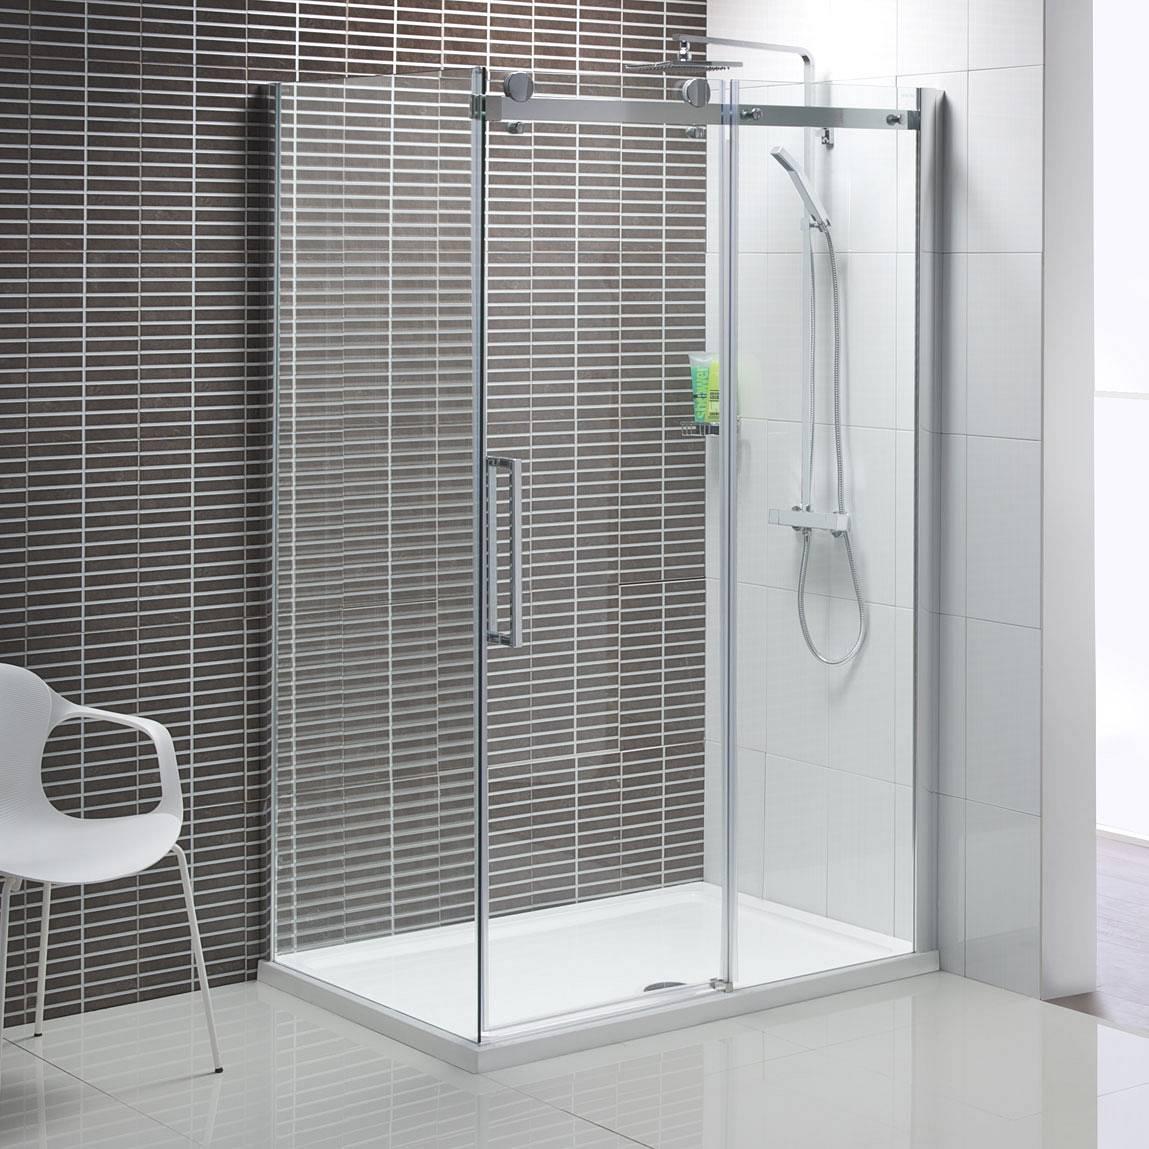 Best Bath Shower Pans Kara Plumbing Plumbing Amp Maintenance